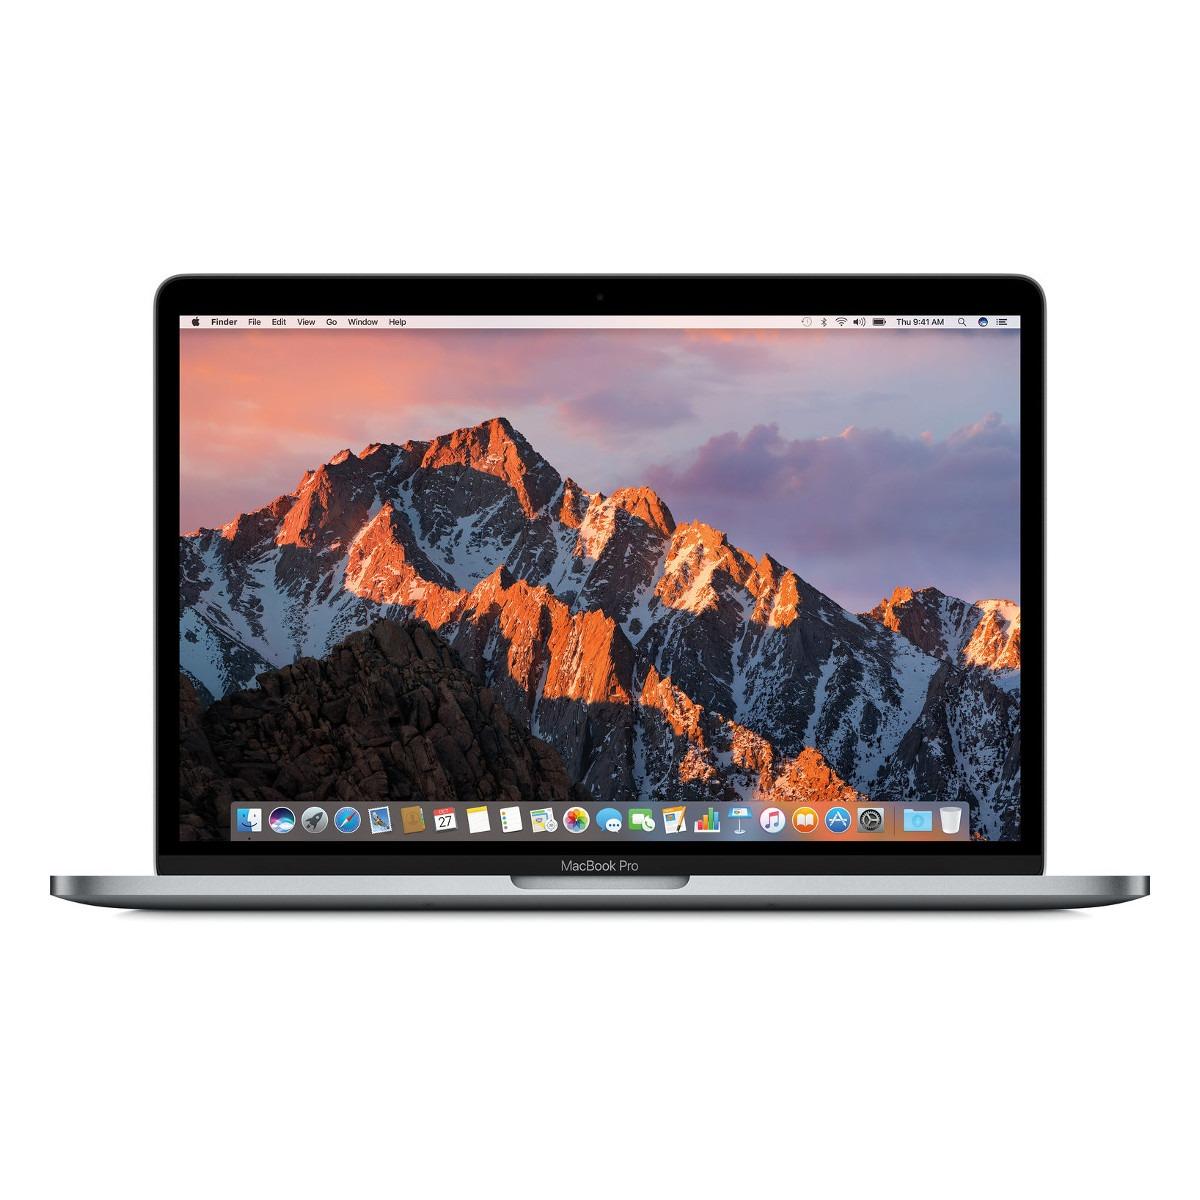 13-inch MacBook Pro with Touch Bar: 2.3GHz quad-core 8th-generation IntelCorei5 processor, 256GB - Space Grey, Model A1989 Portatīvais dators